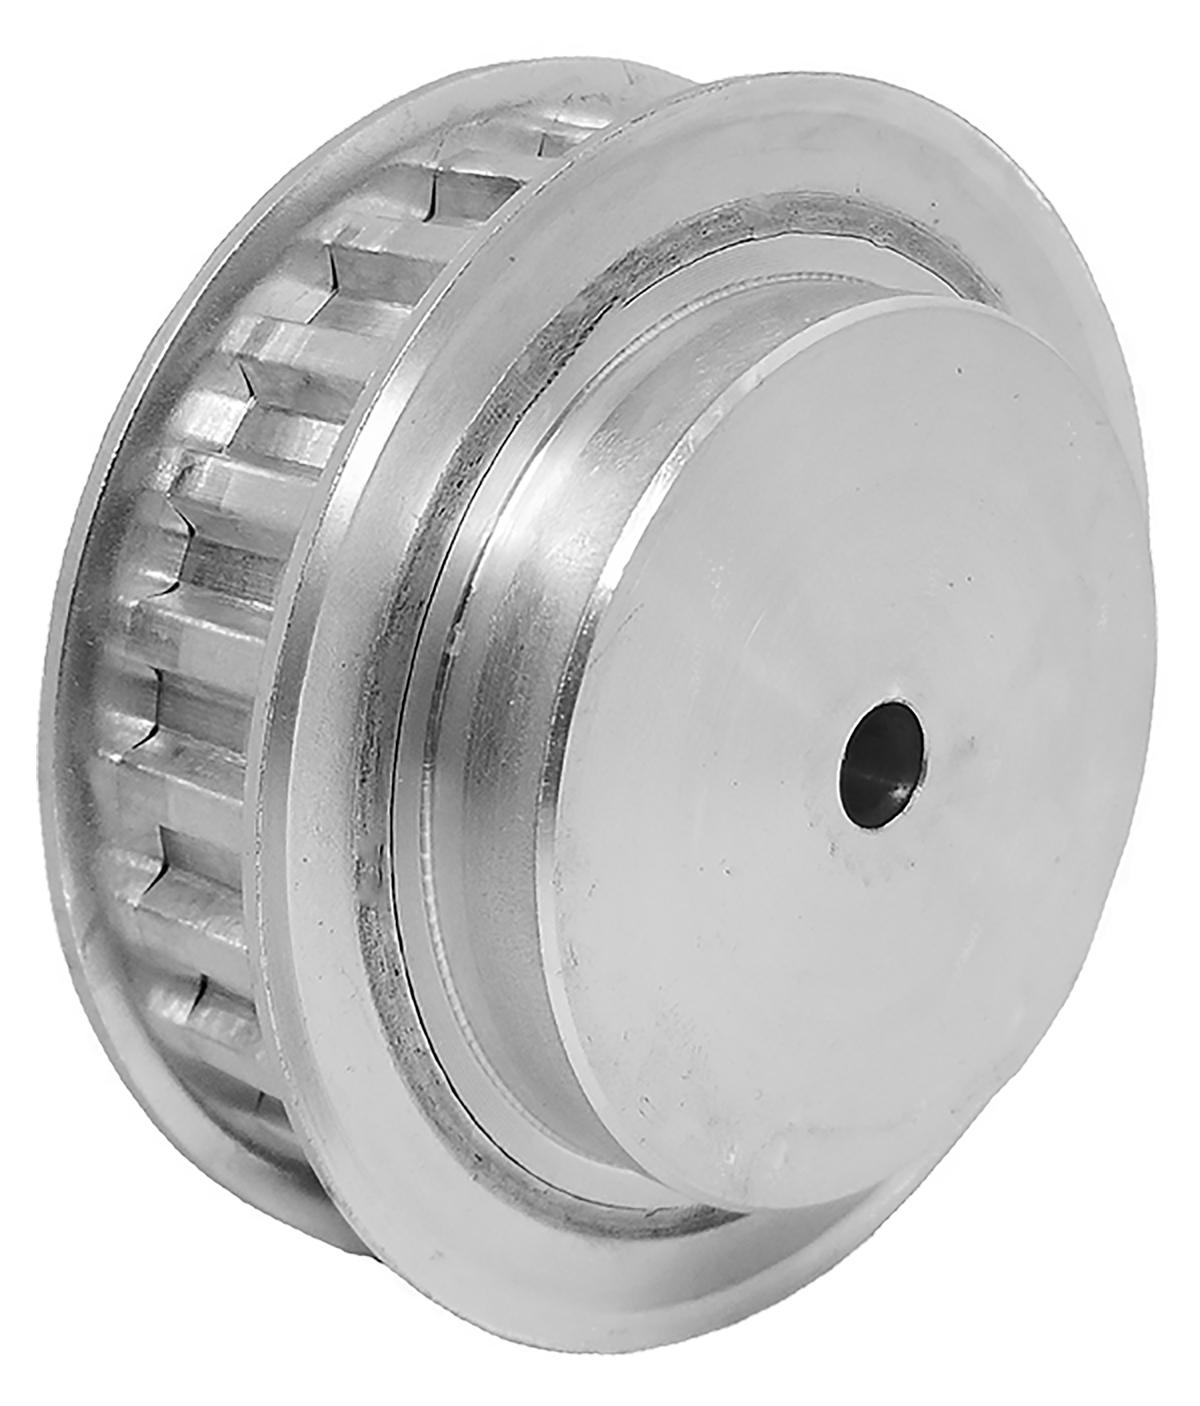 31T10/24-2 - Aluminum Metric Pulleys